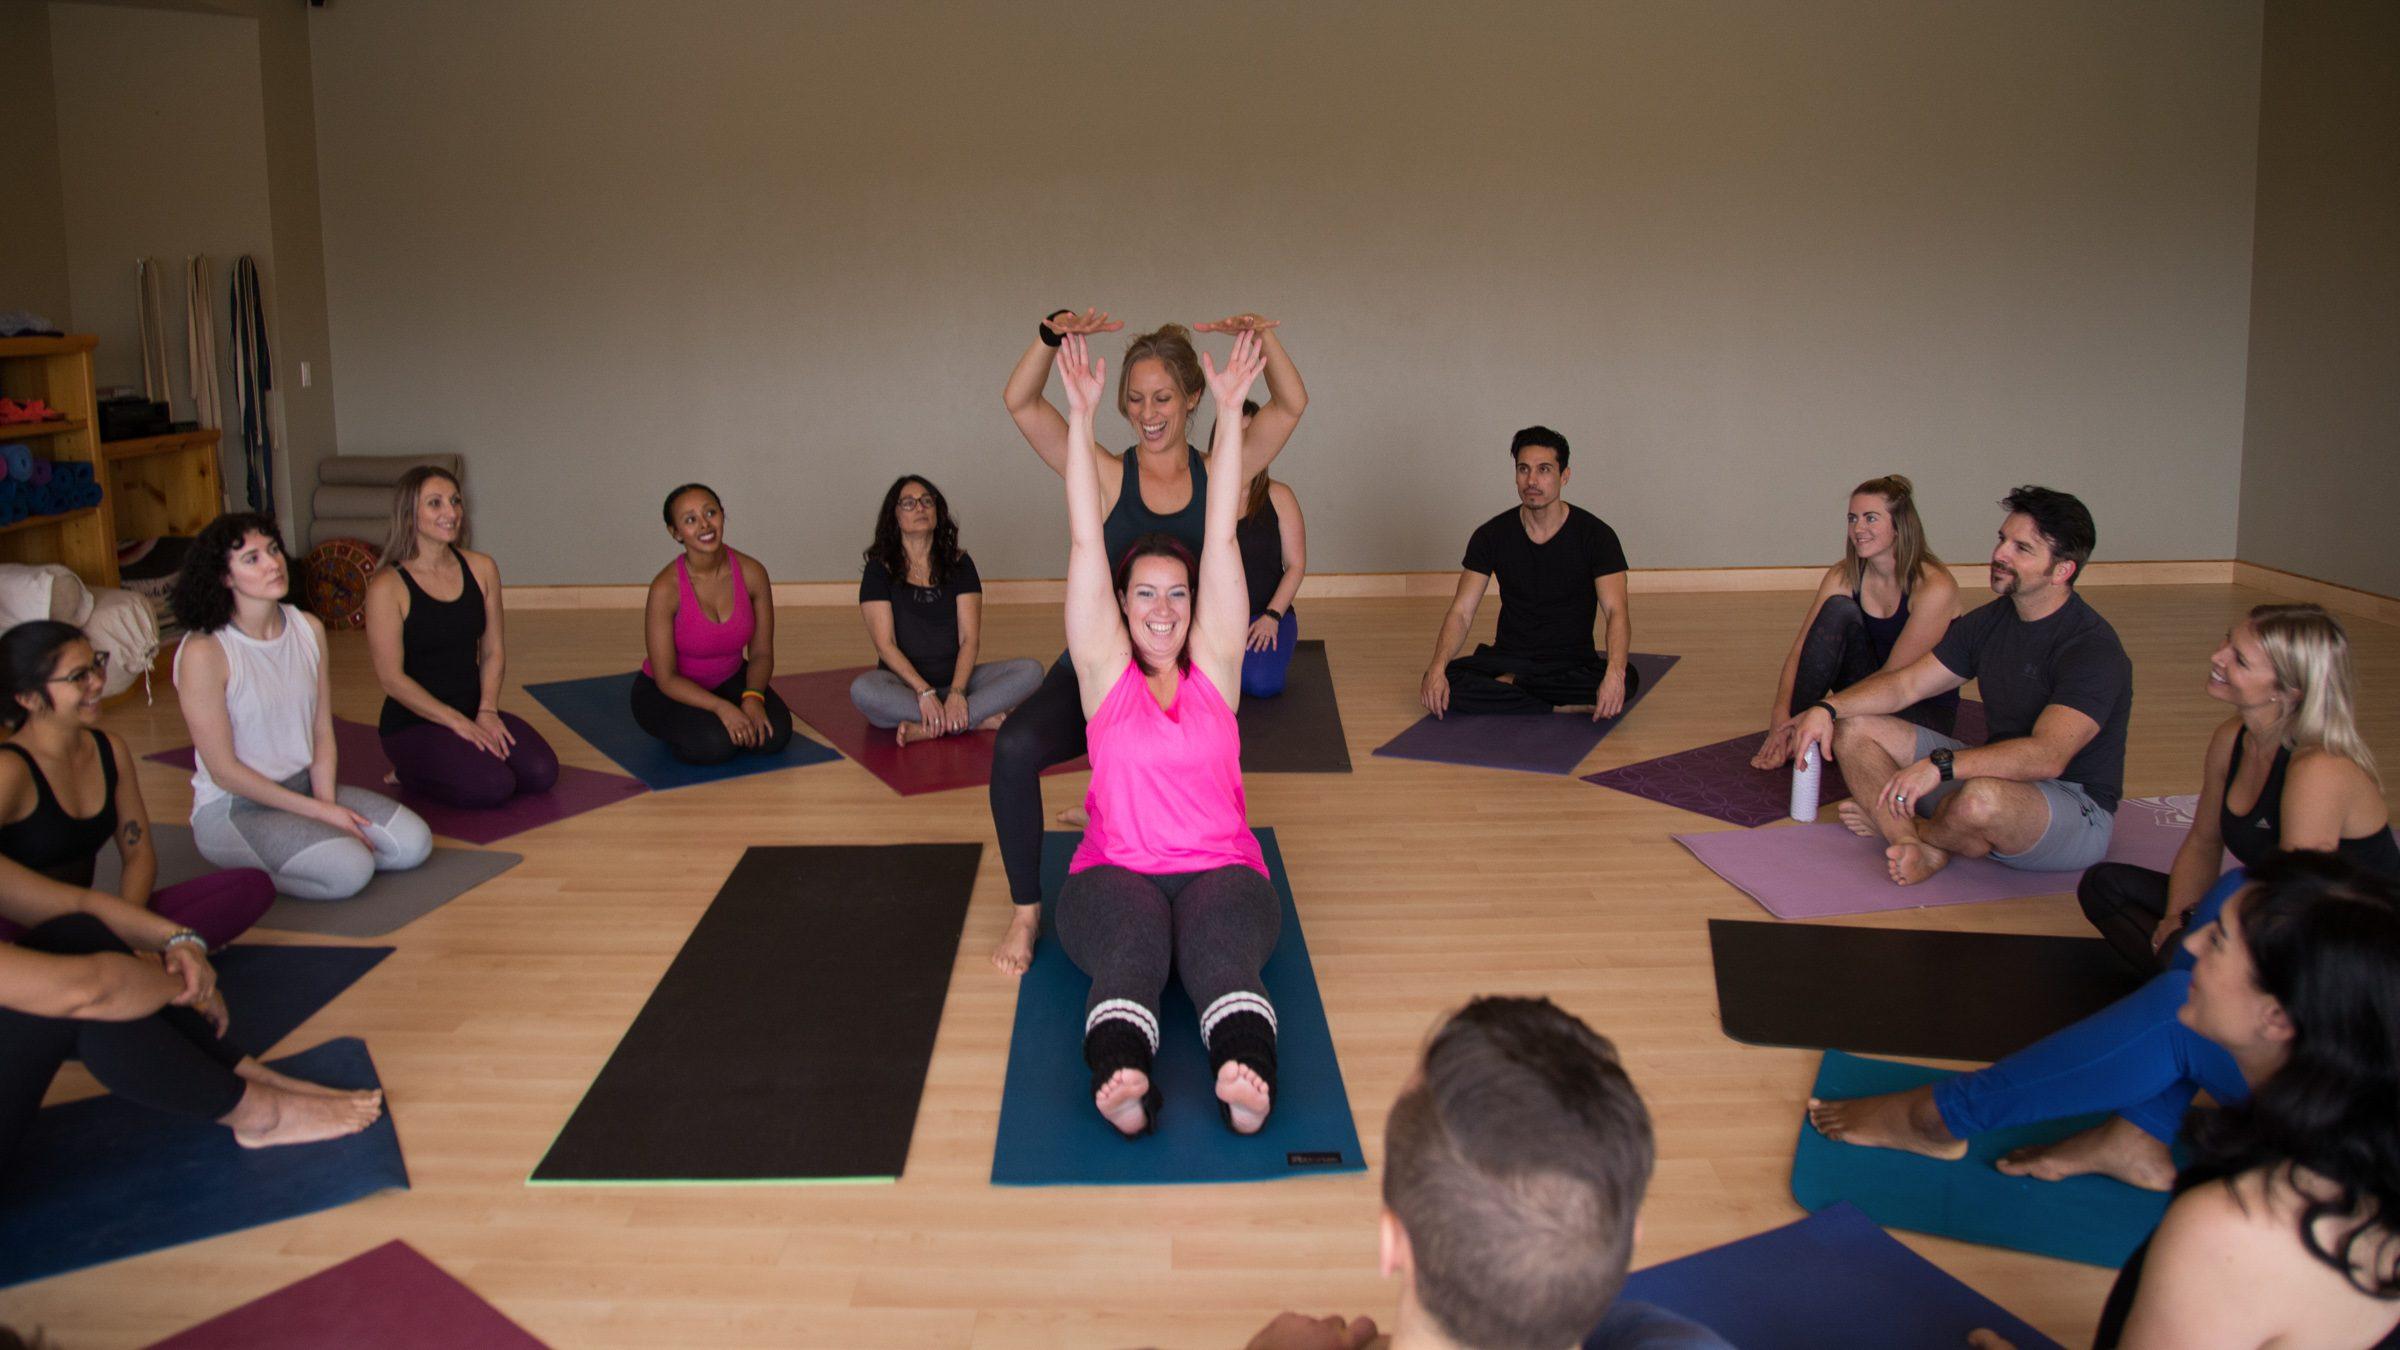 Become a Certified Yoga Teacher, with Pranalife Yoga Teacher Training